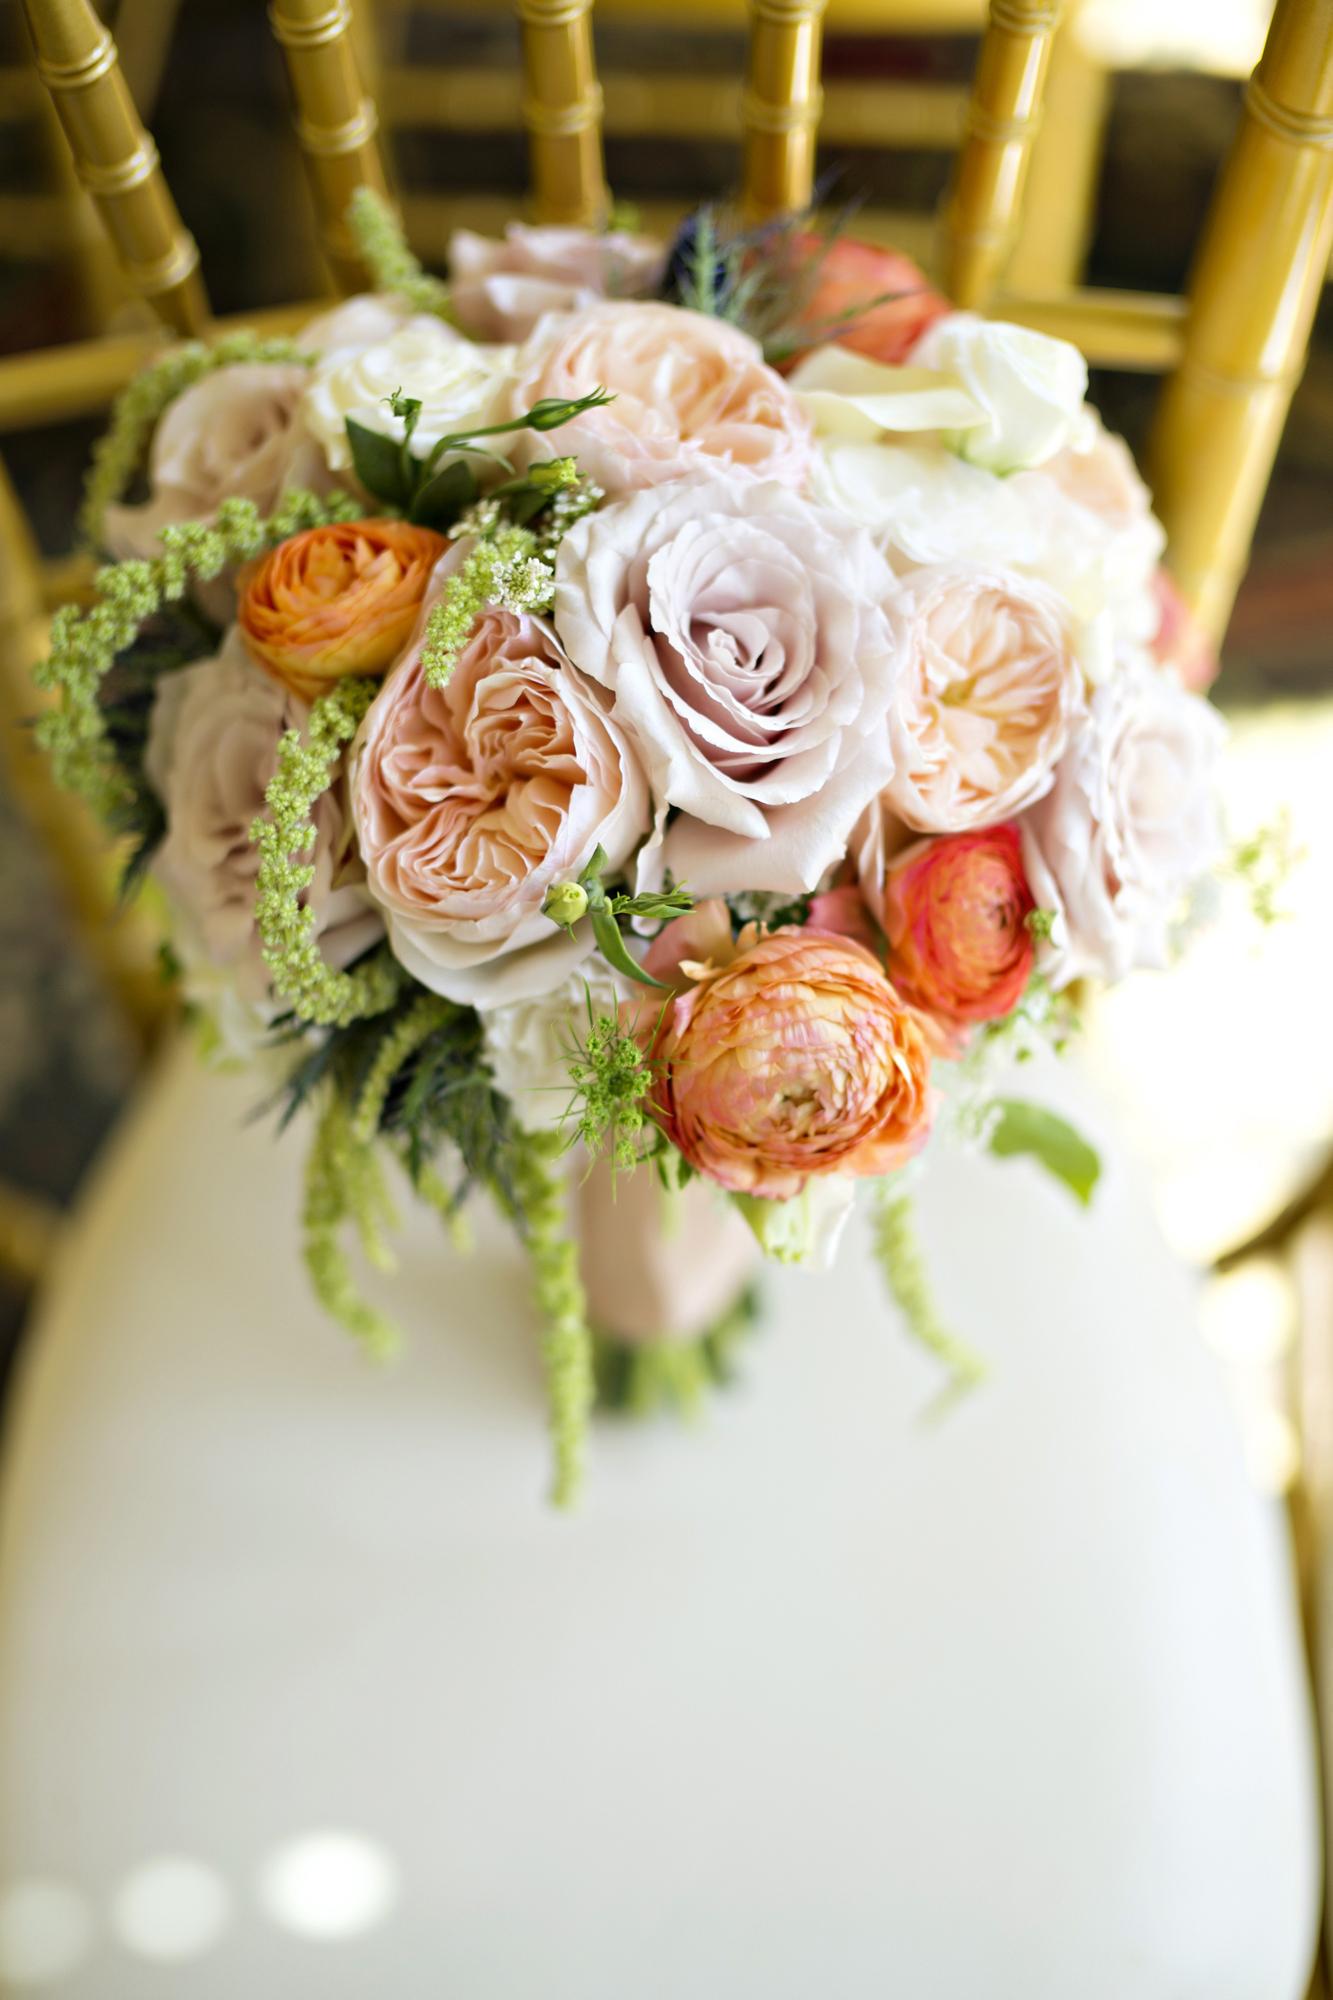 Spring Country Club Luxury Wedding In Atlanta, Ga - Andie Freeman Photography